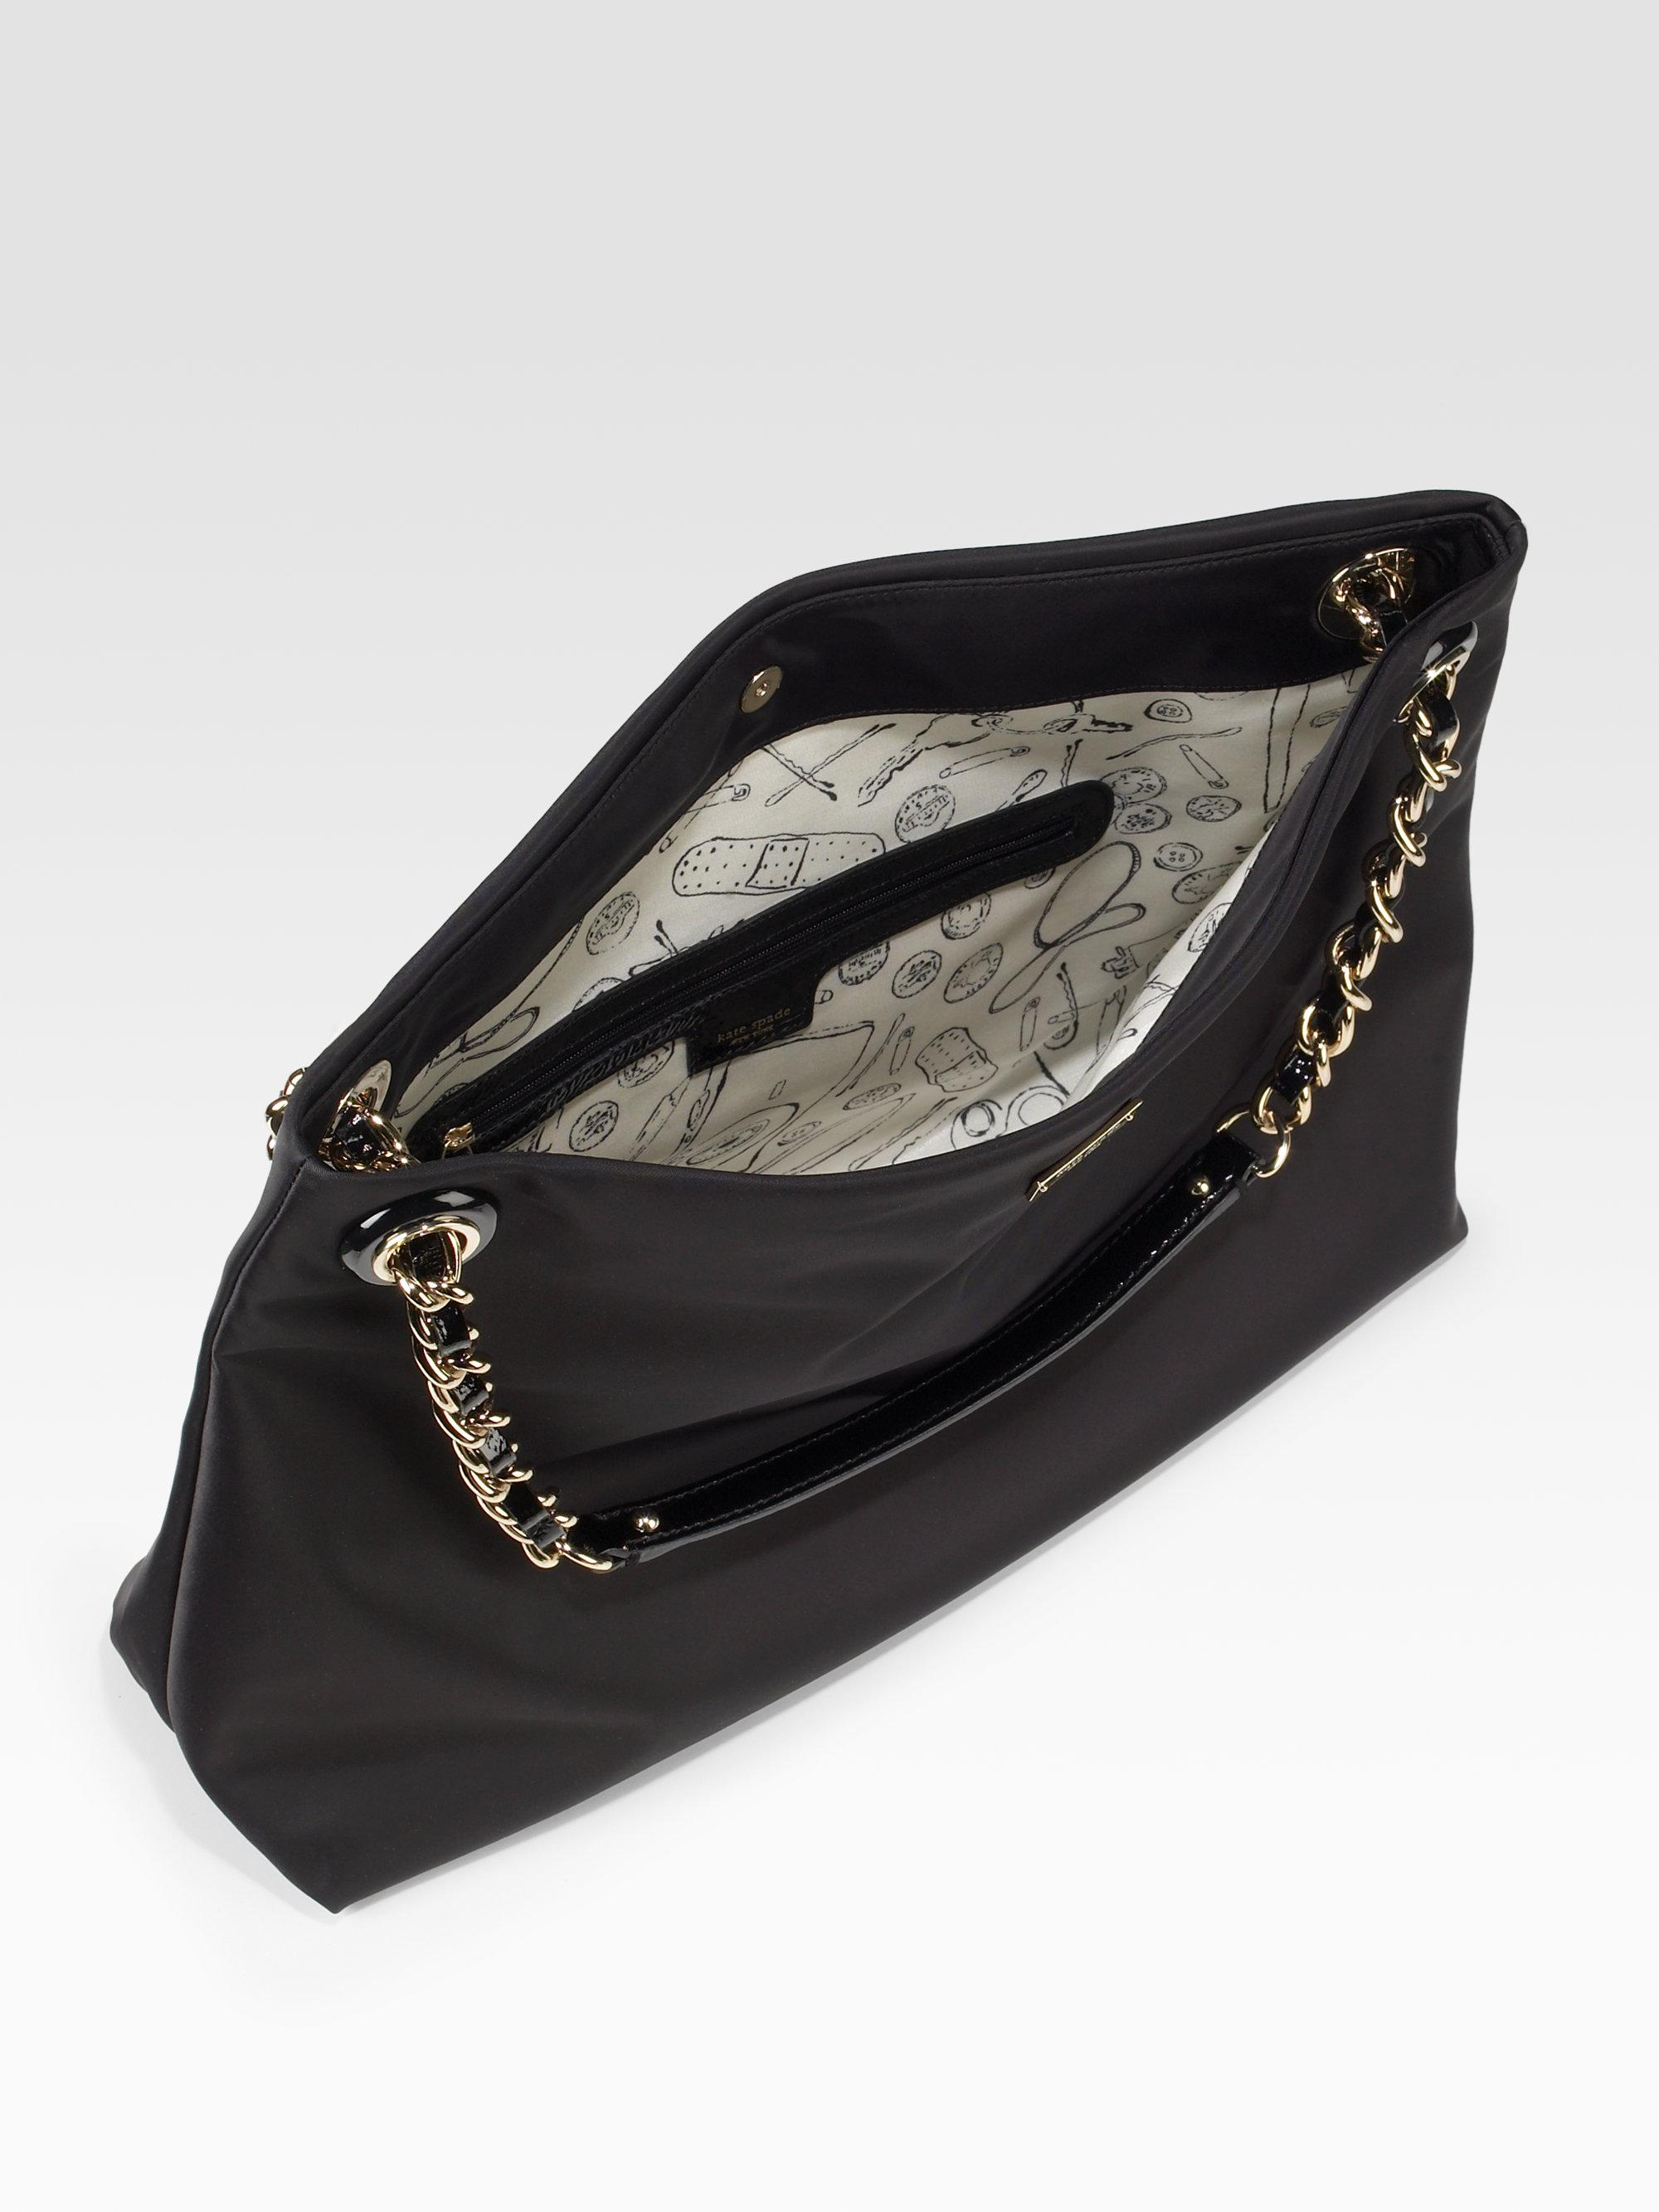 Tel Handbags Chain Strap Shoulder Bag Large Capacity Casual Tote